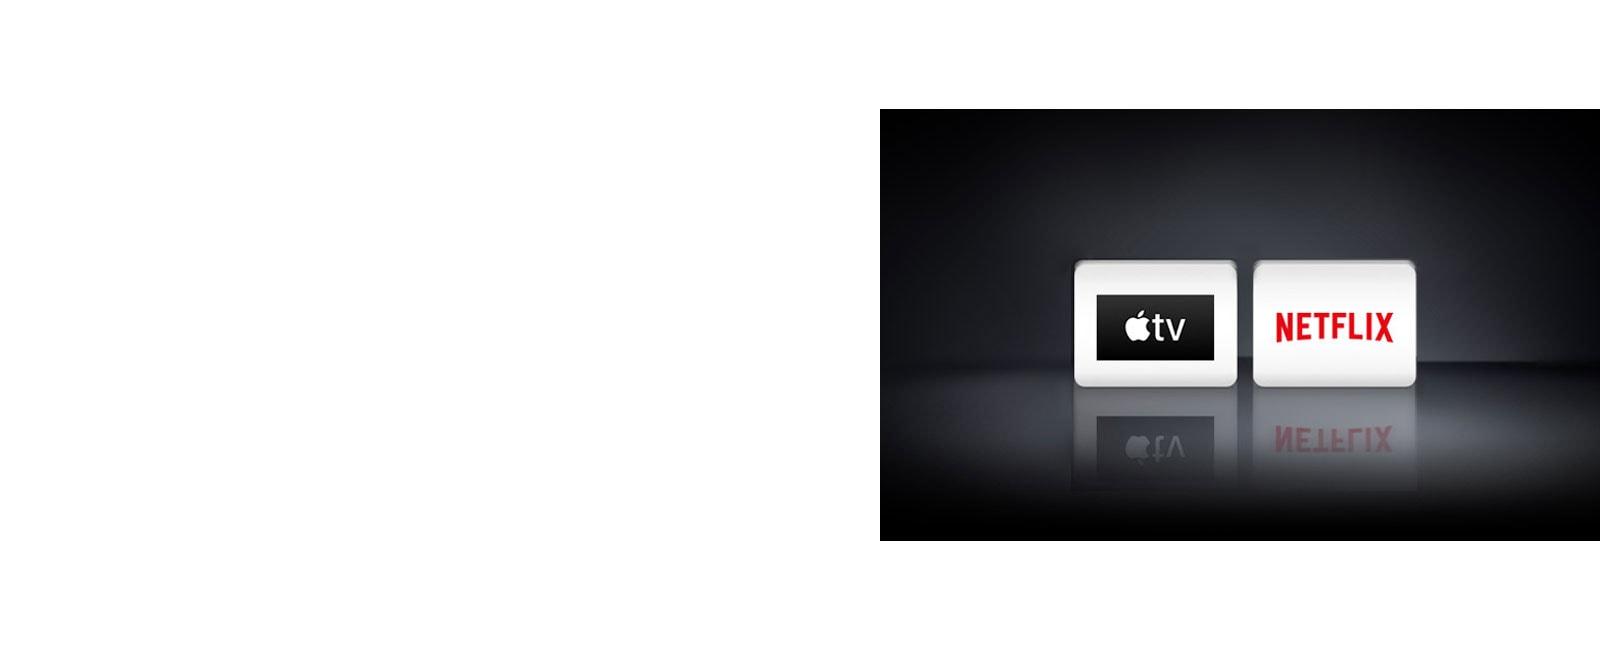 Empat logo: Apple TV app dan Netflix.